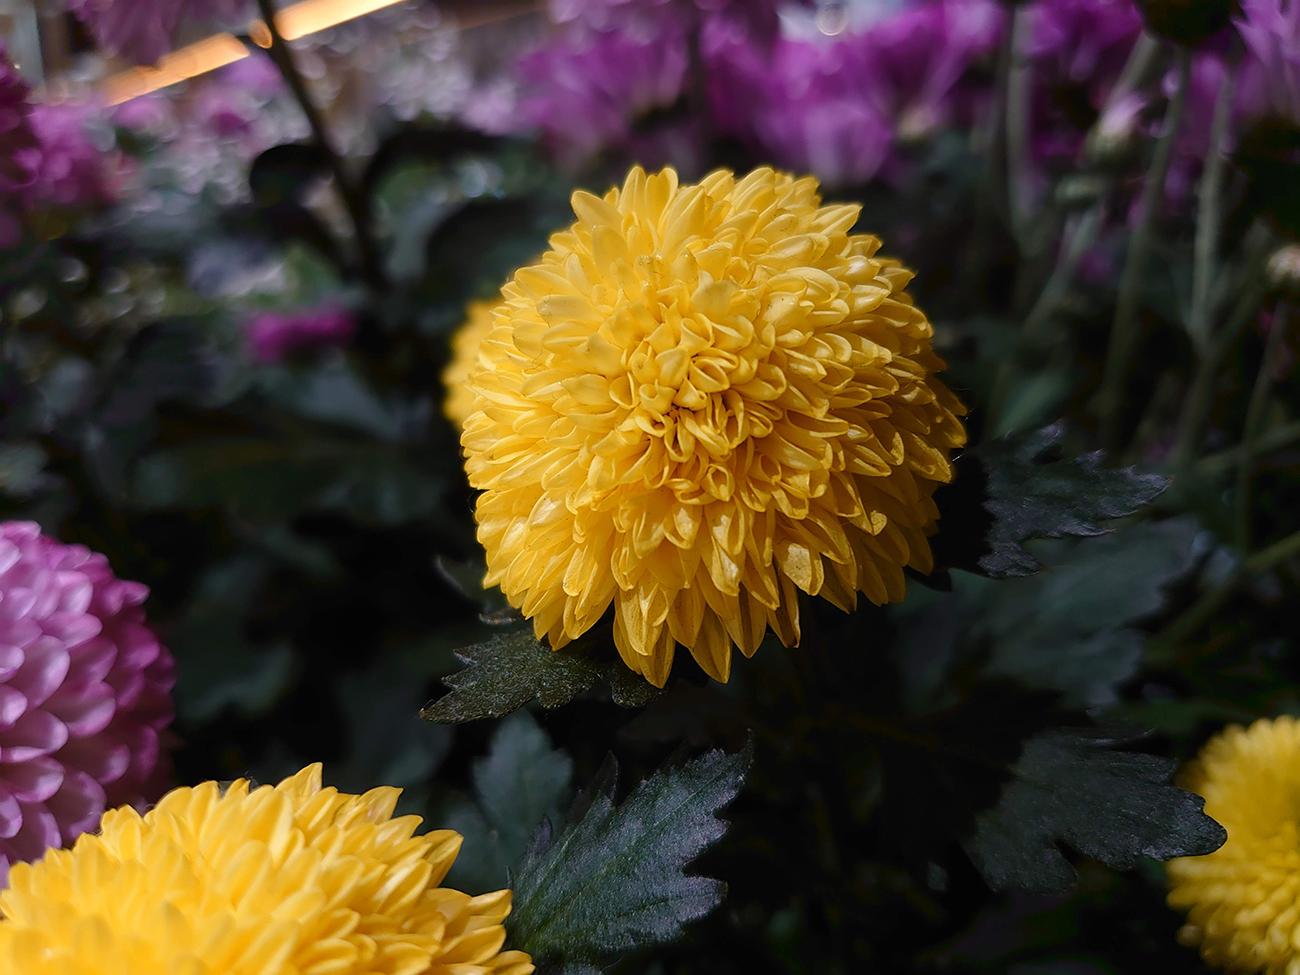 Xperia 5のカメラで撮影した花